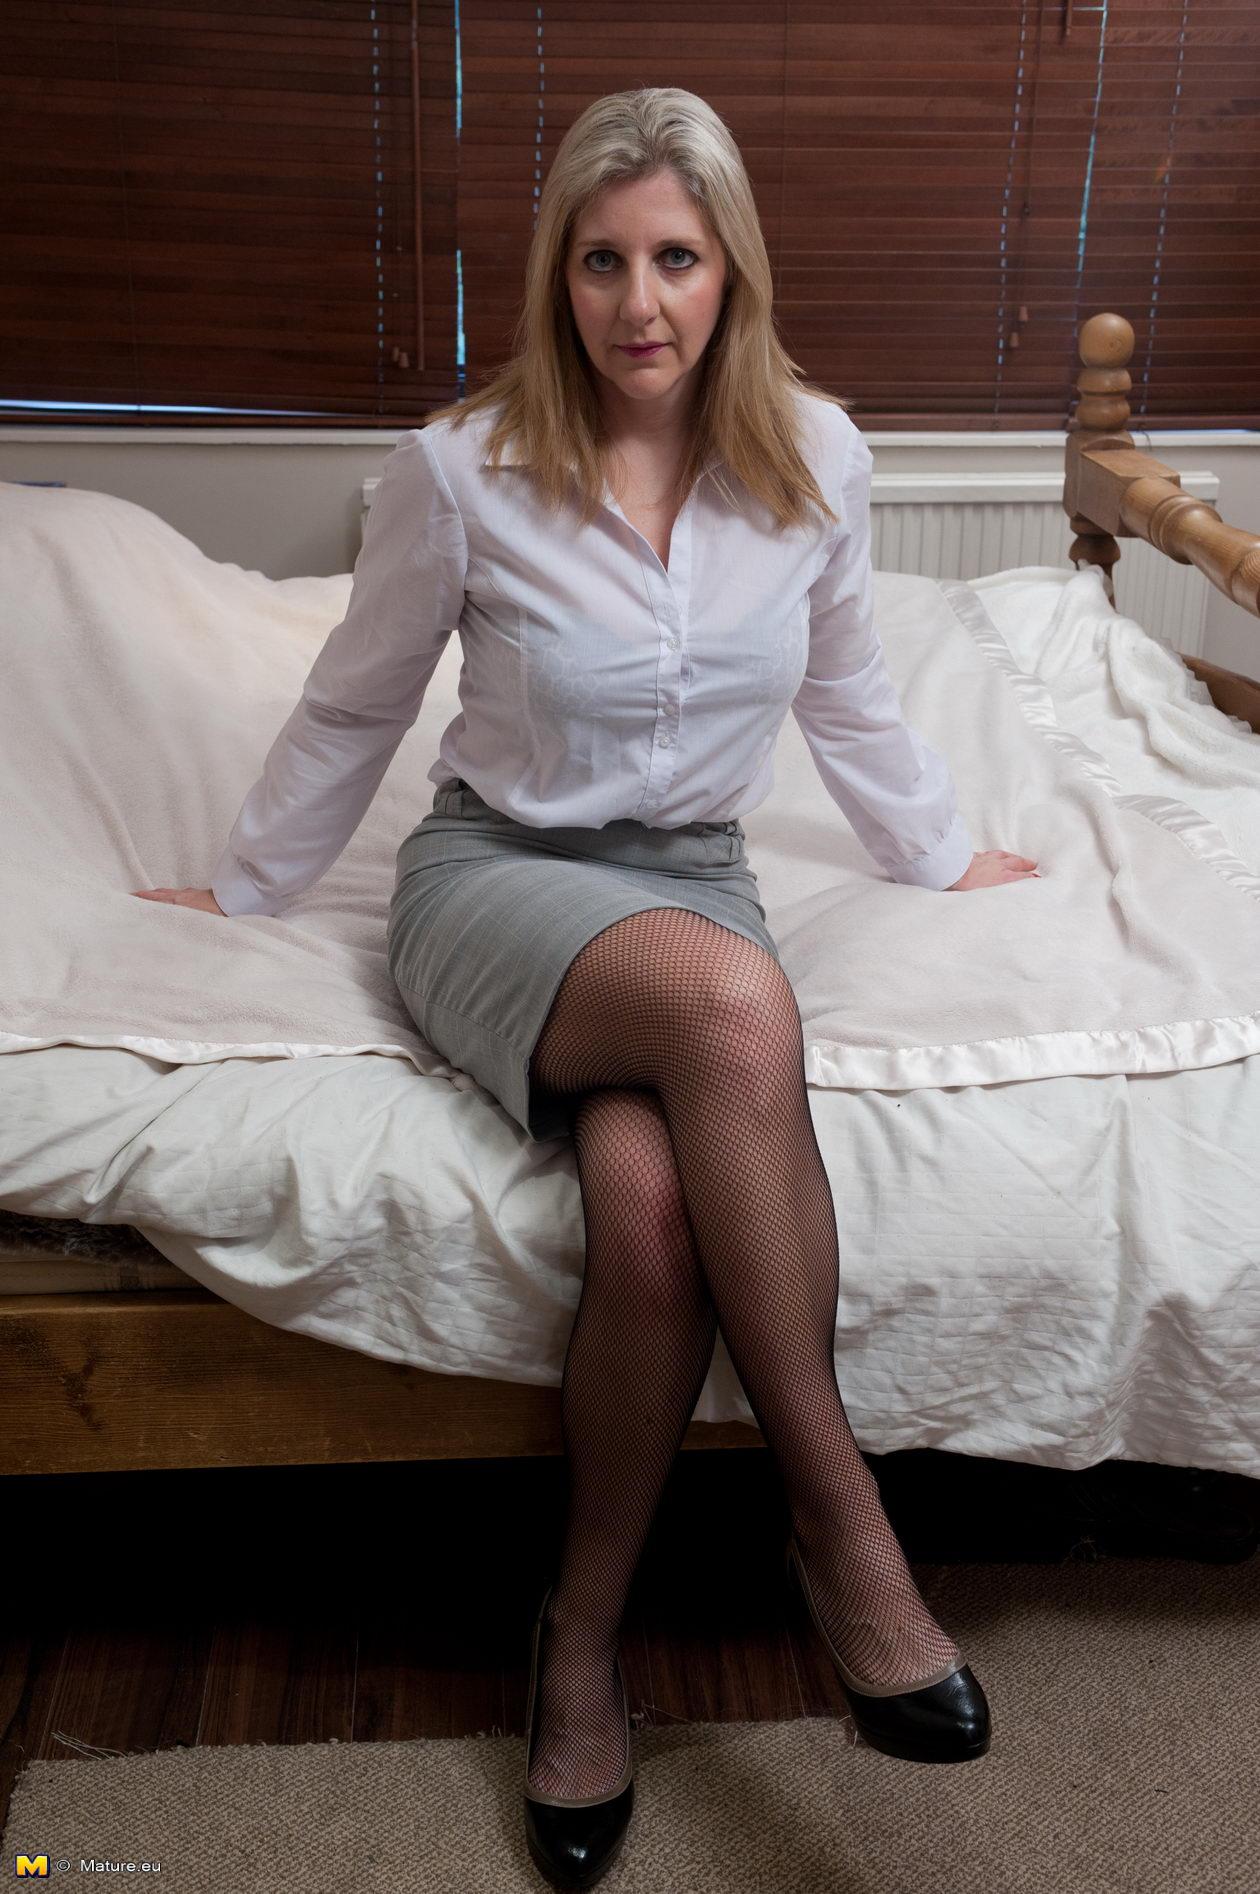 image German milf in red lingerie get hard fucked by big dick